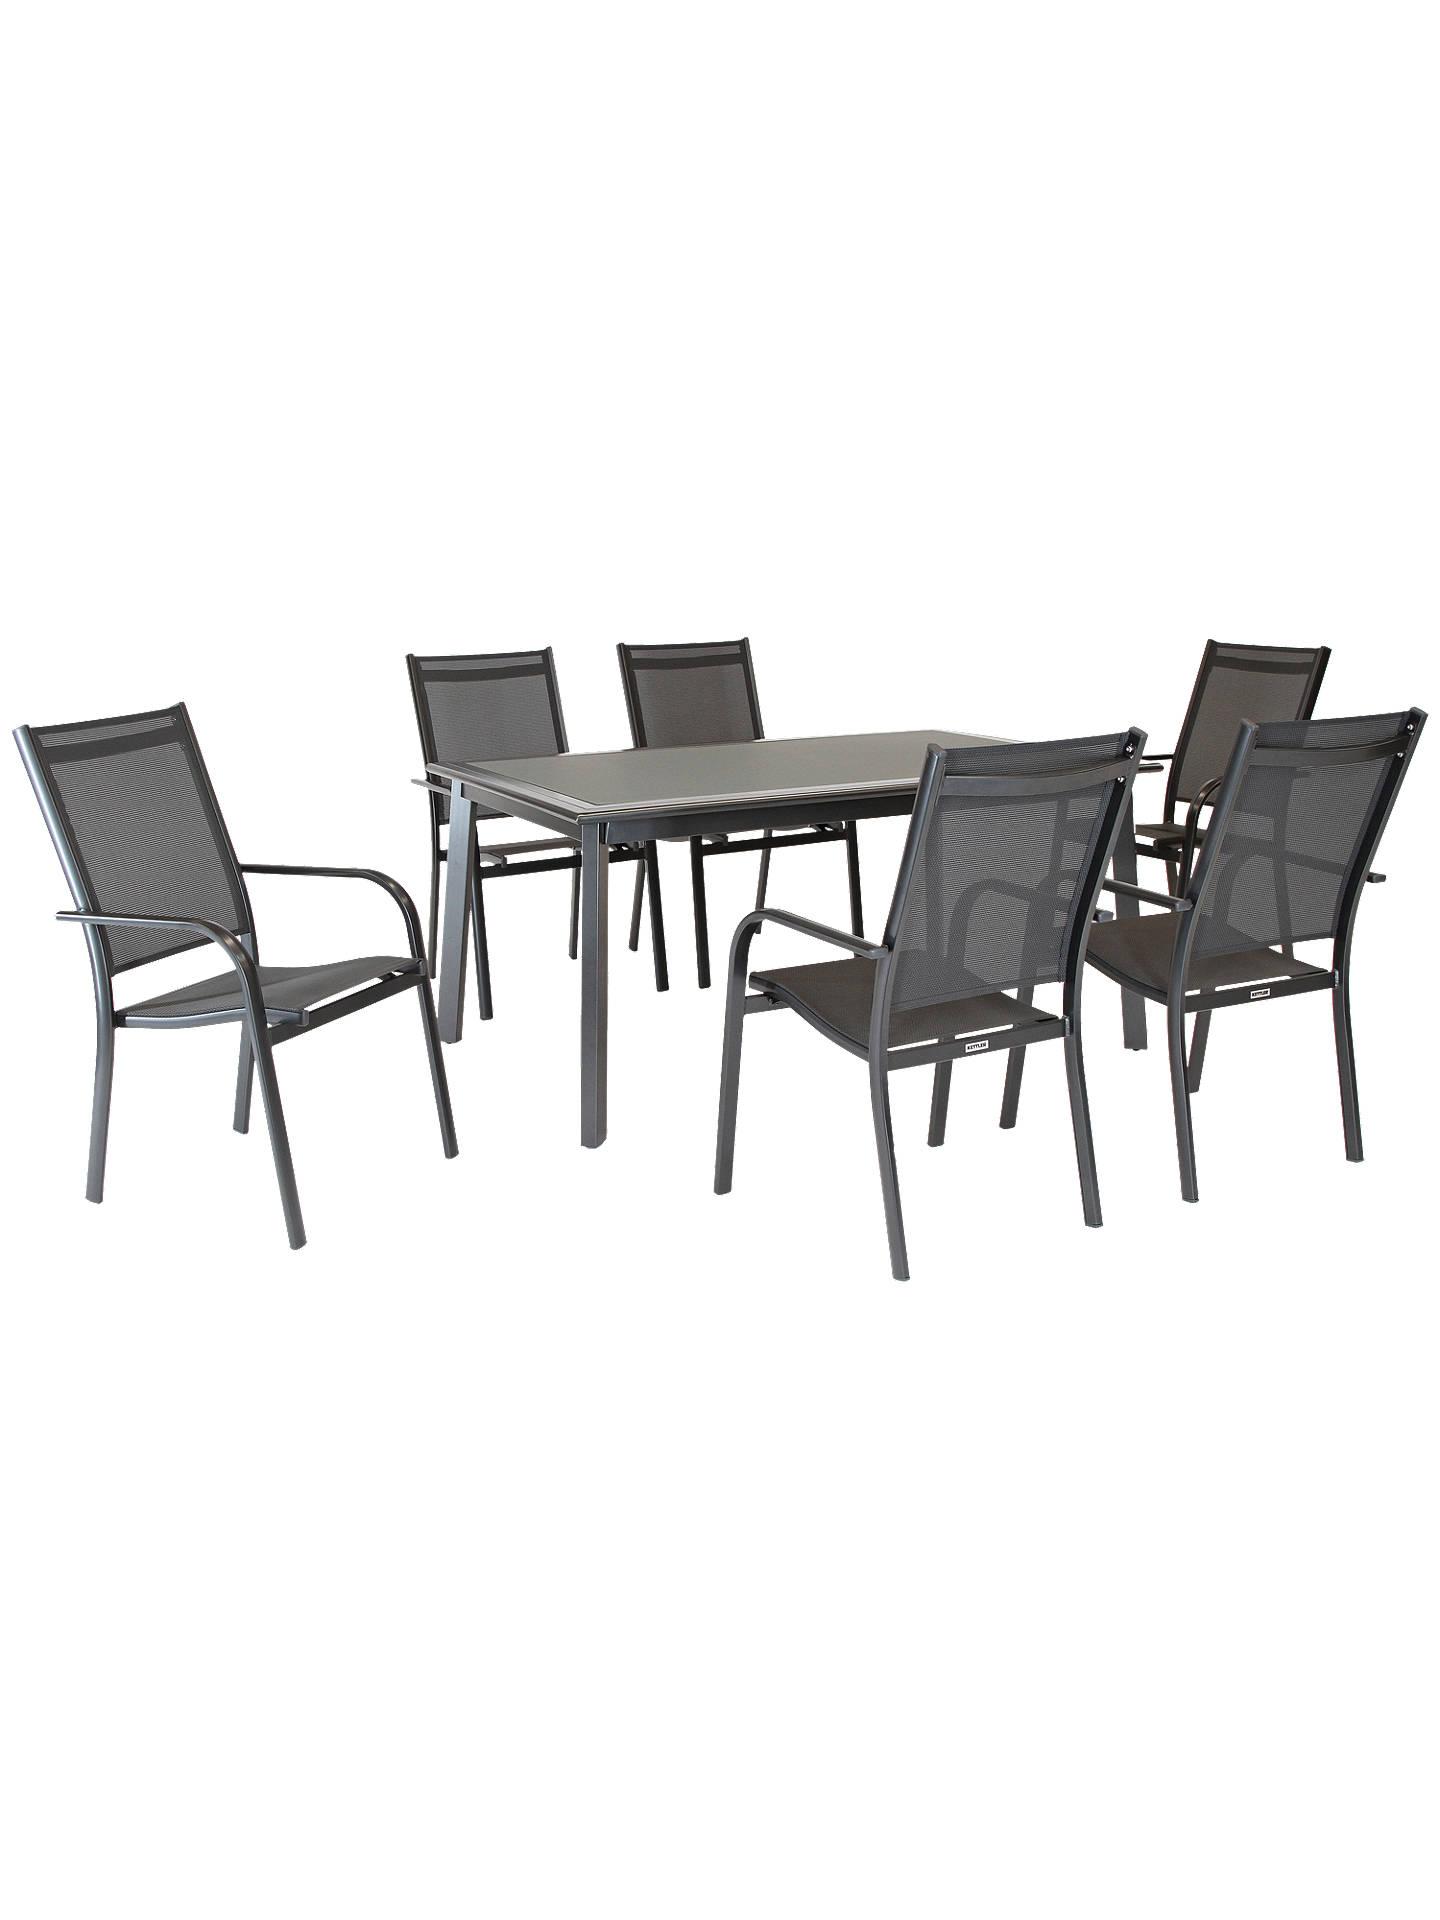 KETTLER Surf 6 Seater Garden Dining Table & Chairs Set at John Lewis ...